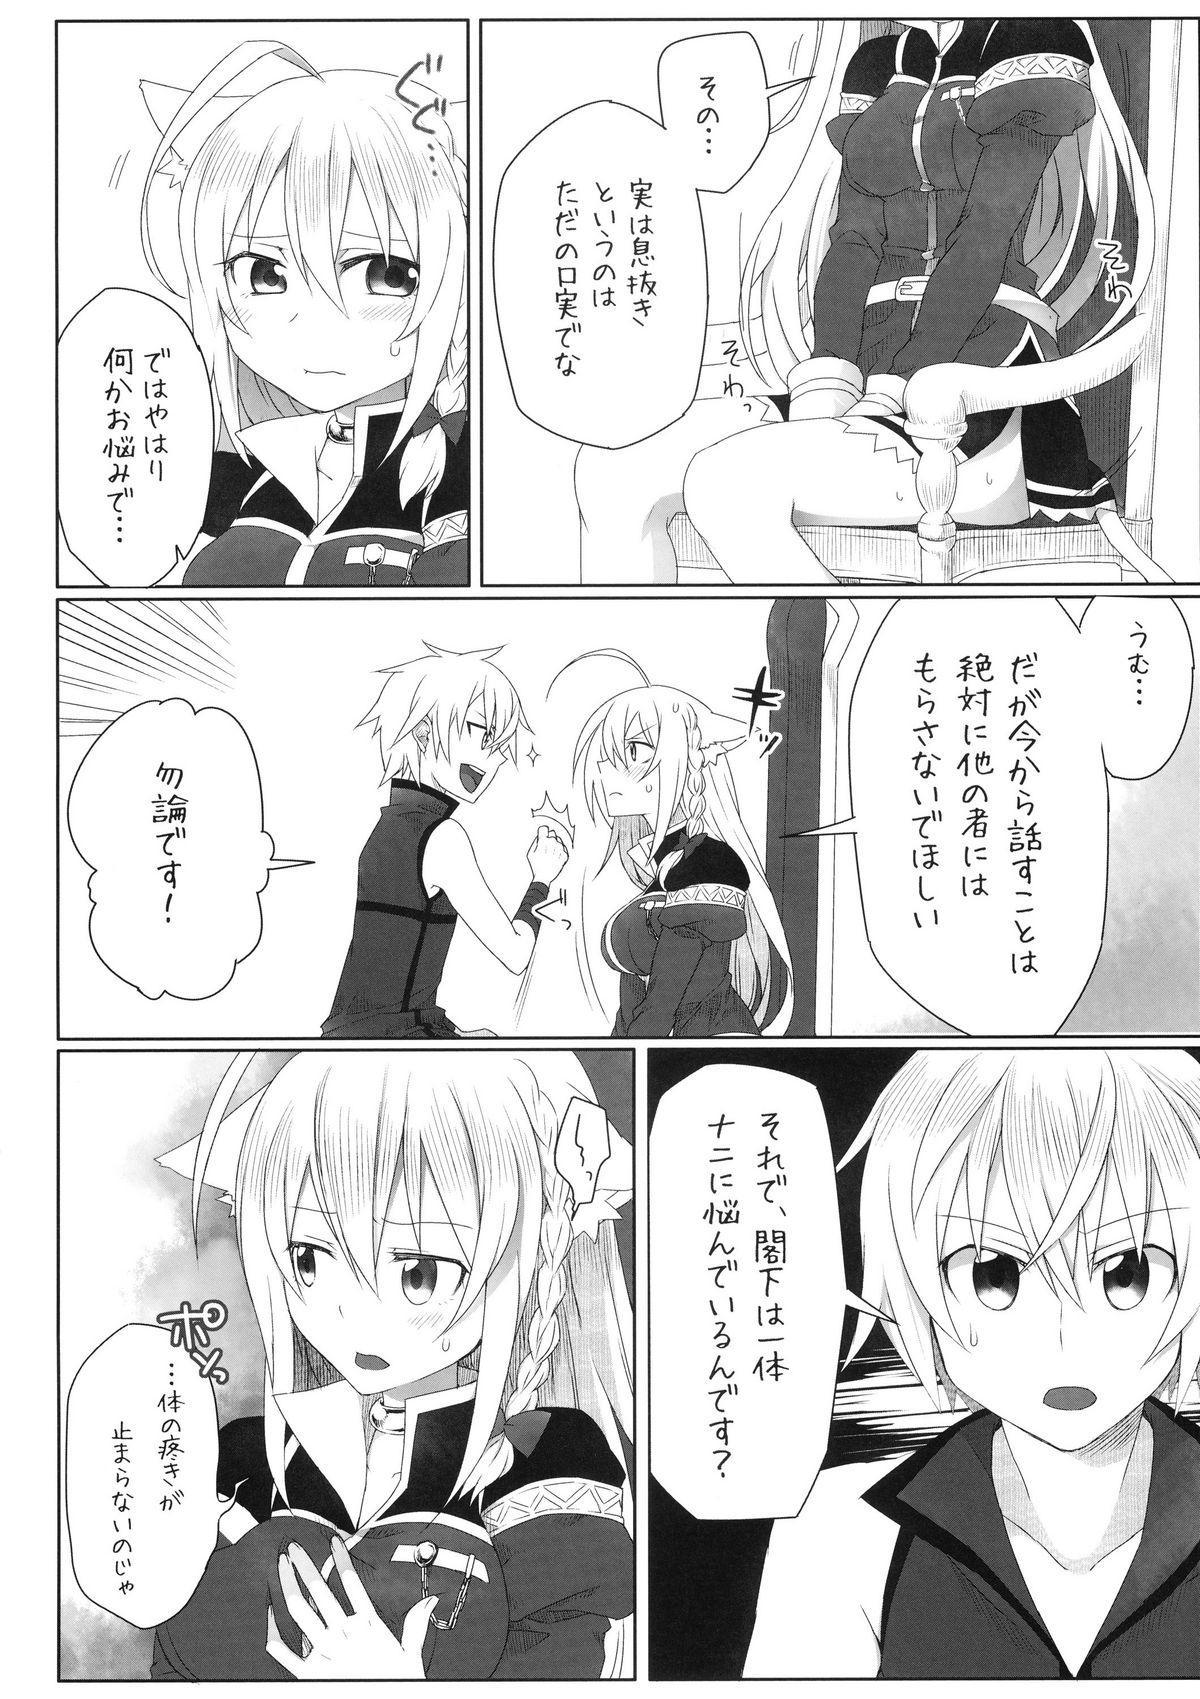 Hatsujou! Neko Hime Choukyou Sen!? 5